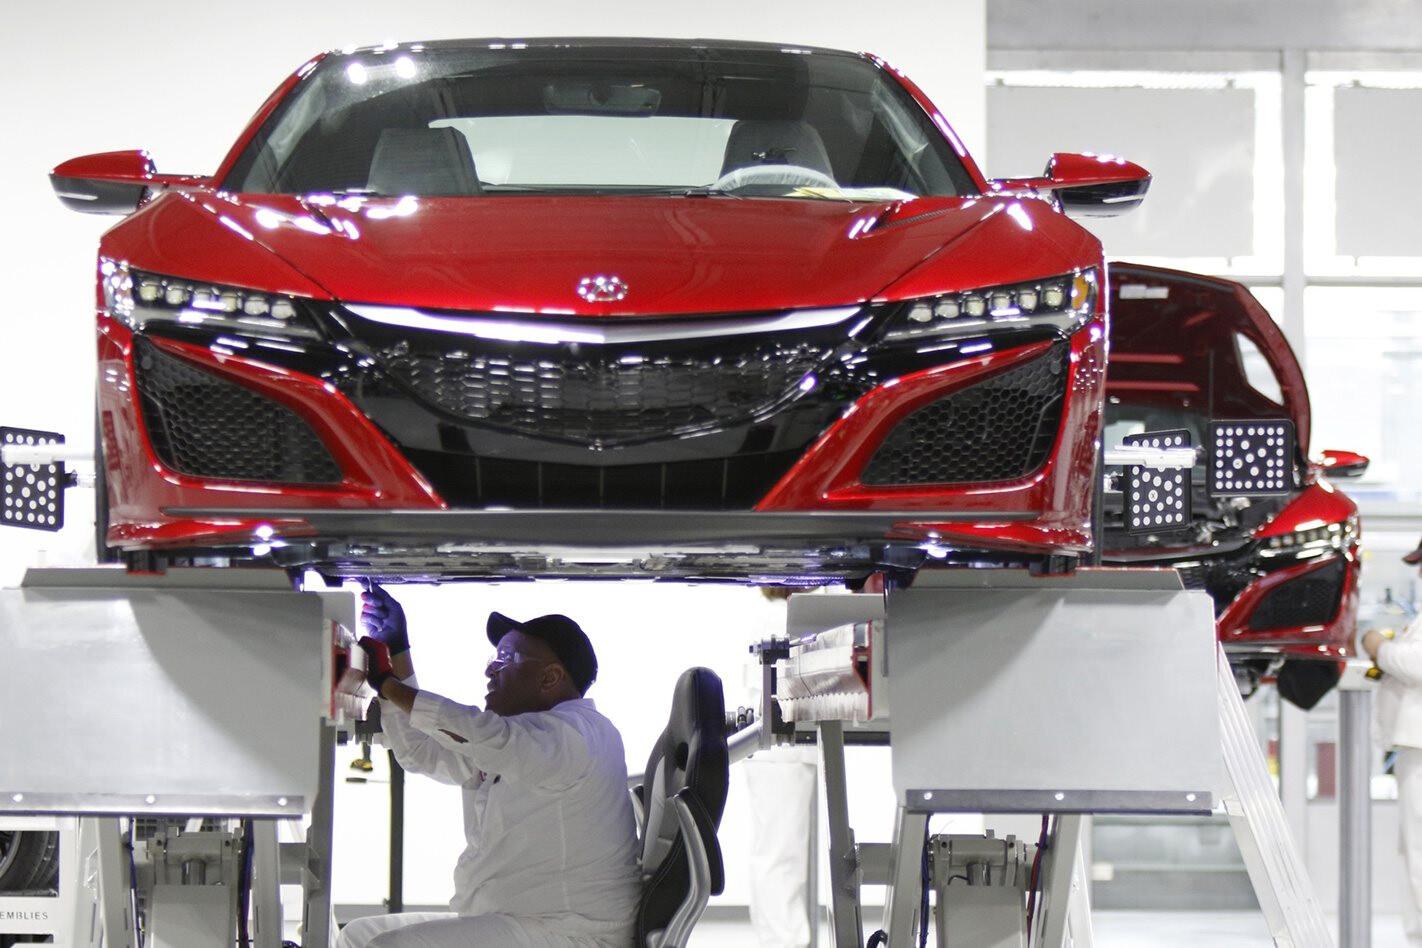 New Honda NSX supercar